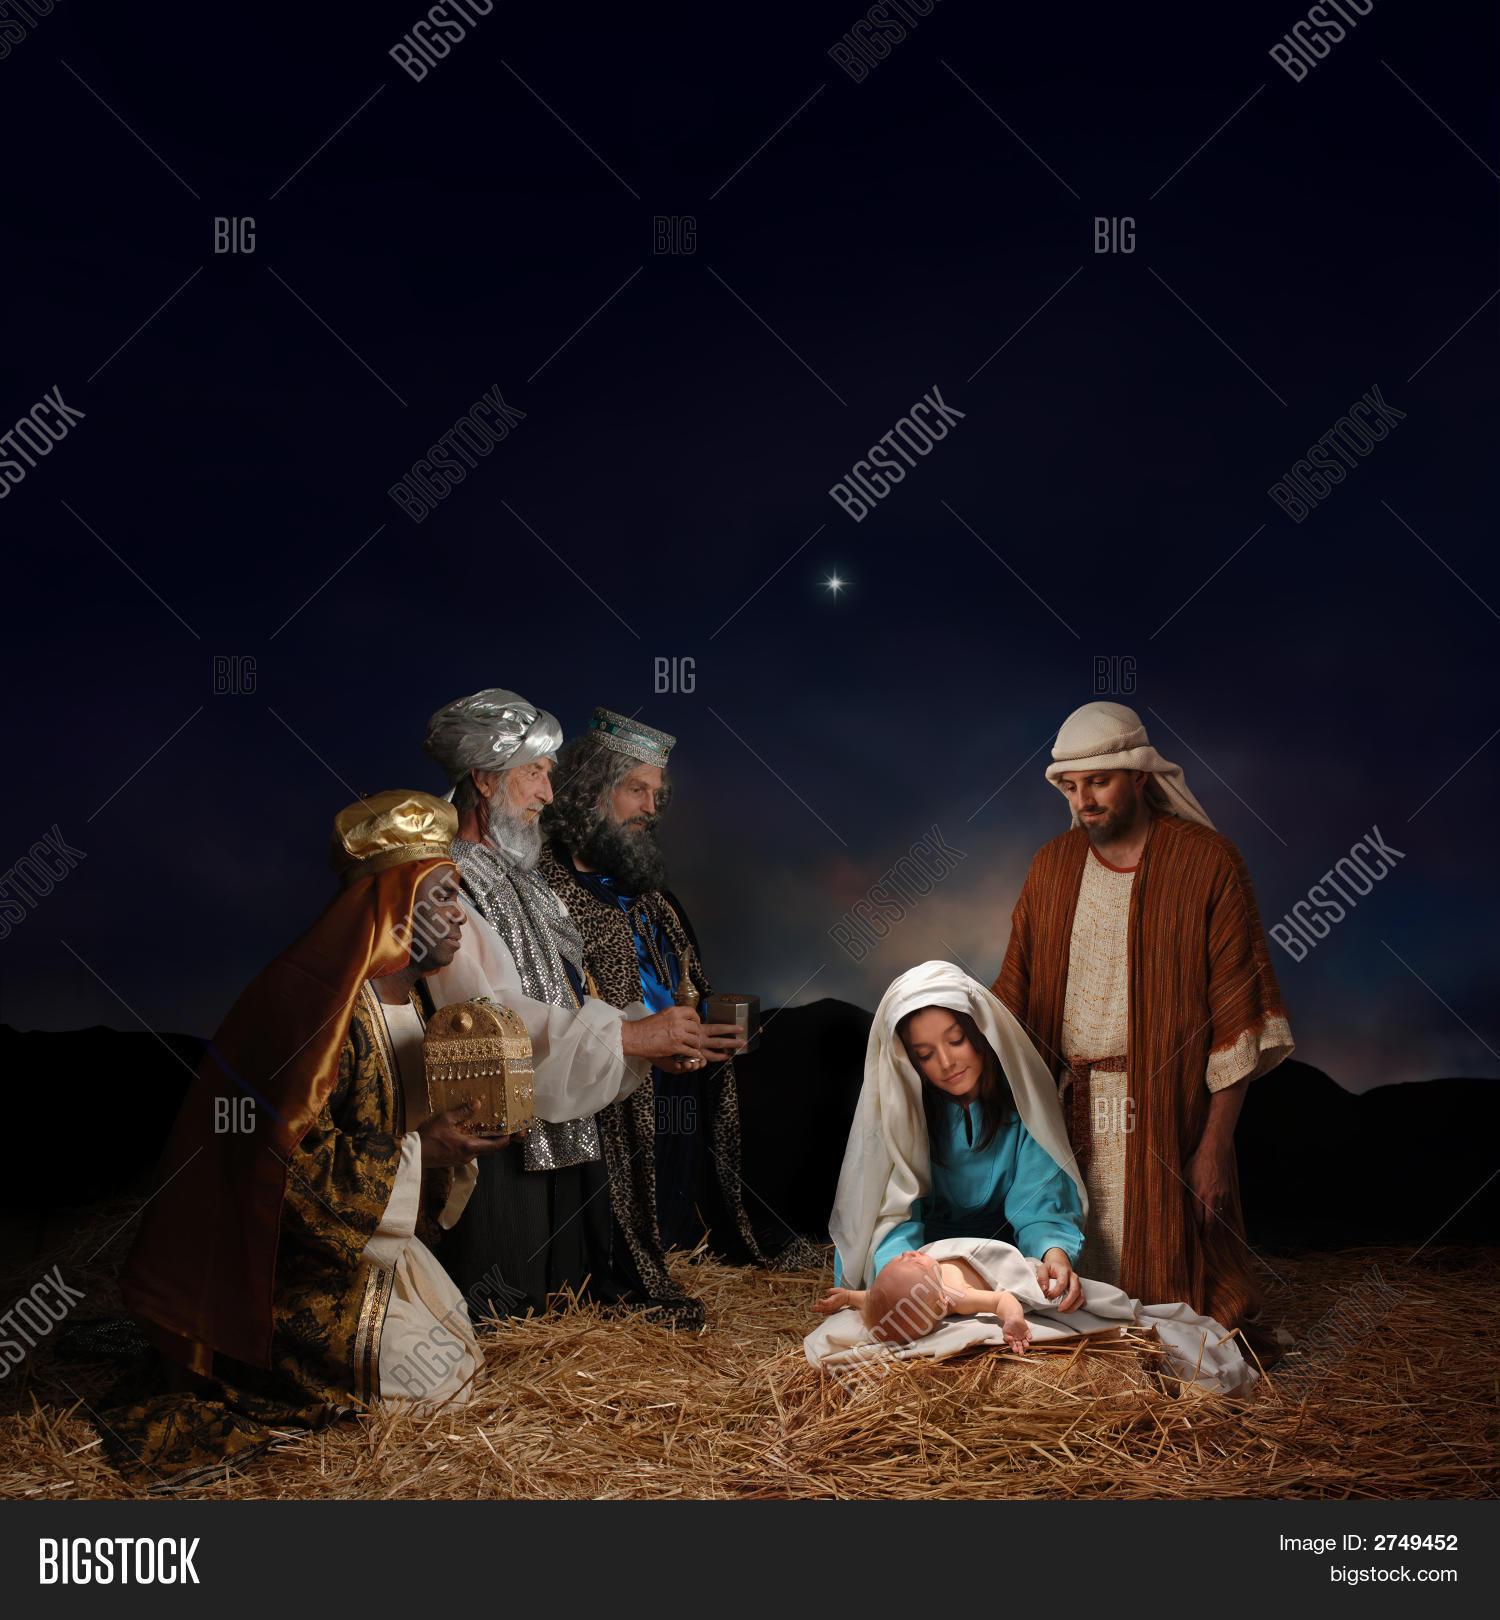 baby jesus,bethlehem,christianity,christmas,christmas nativity,christmas star,conception,dusk,frankincense,gold,hay,immaculate,jesus,joseph,lord,manger,mary,men,messiah,mother,myrrh,nativity,nativity scene,scene,star,three,wise